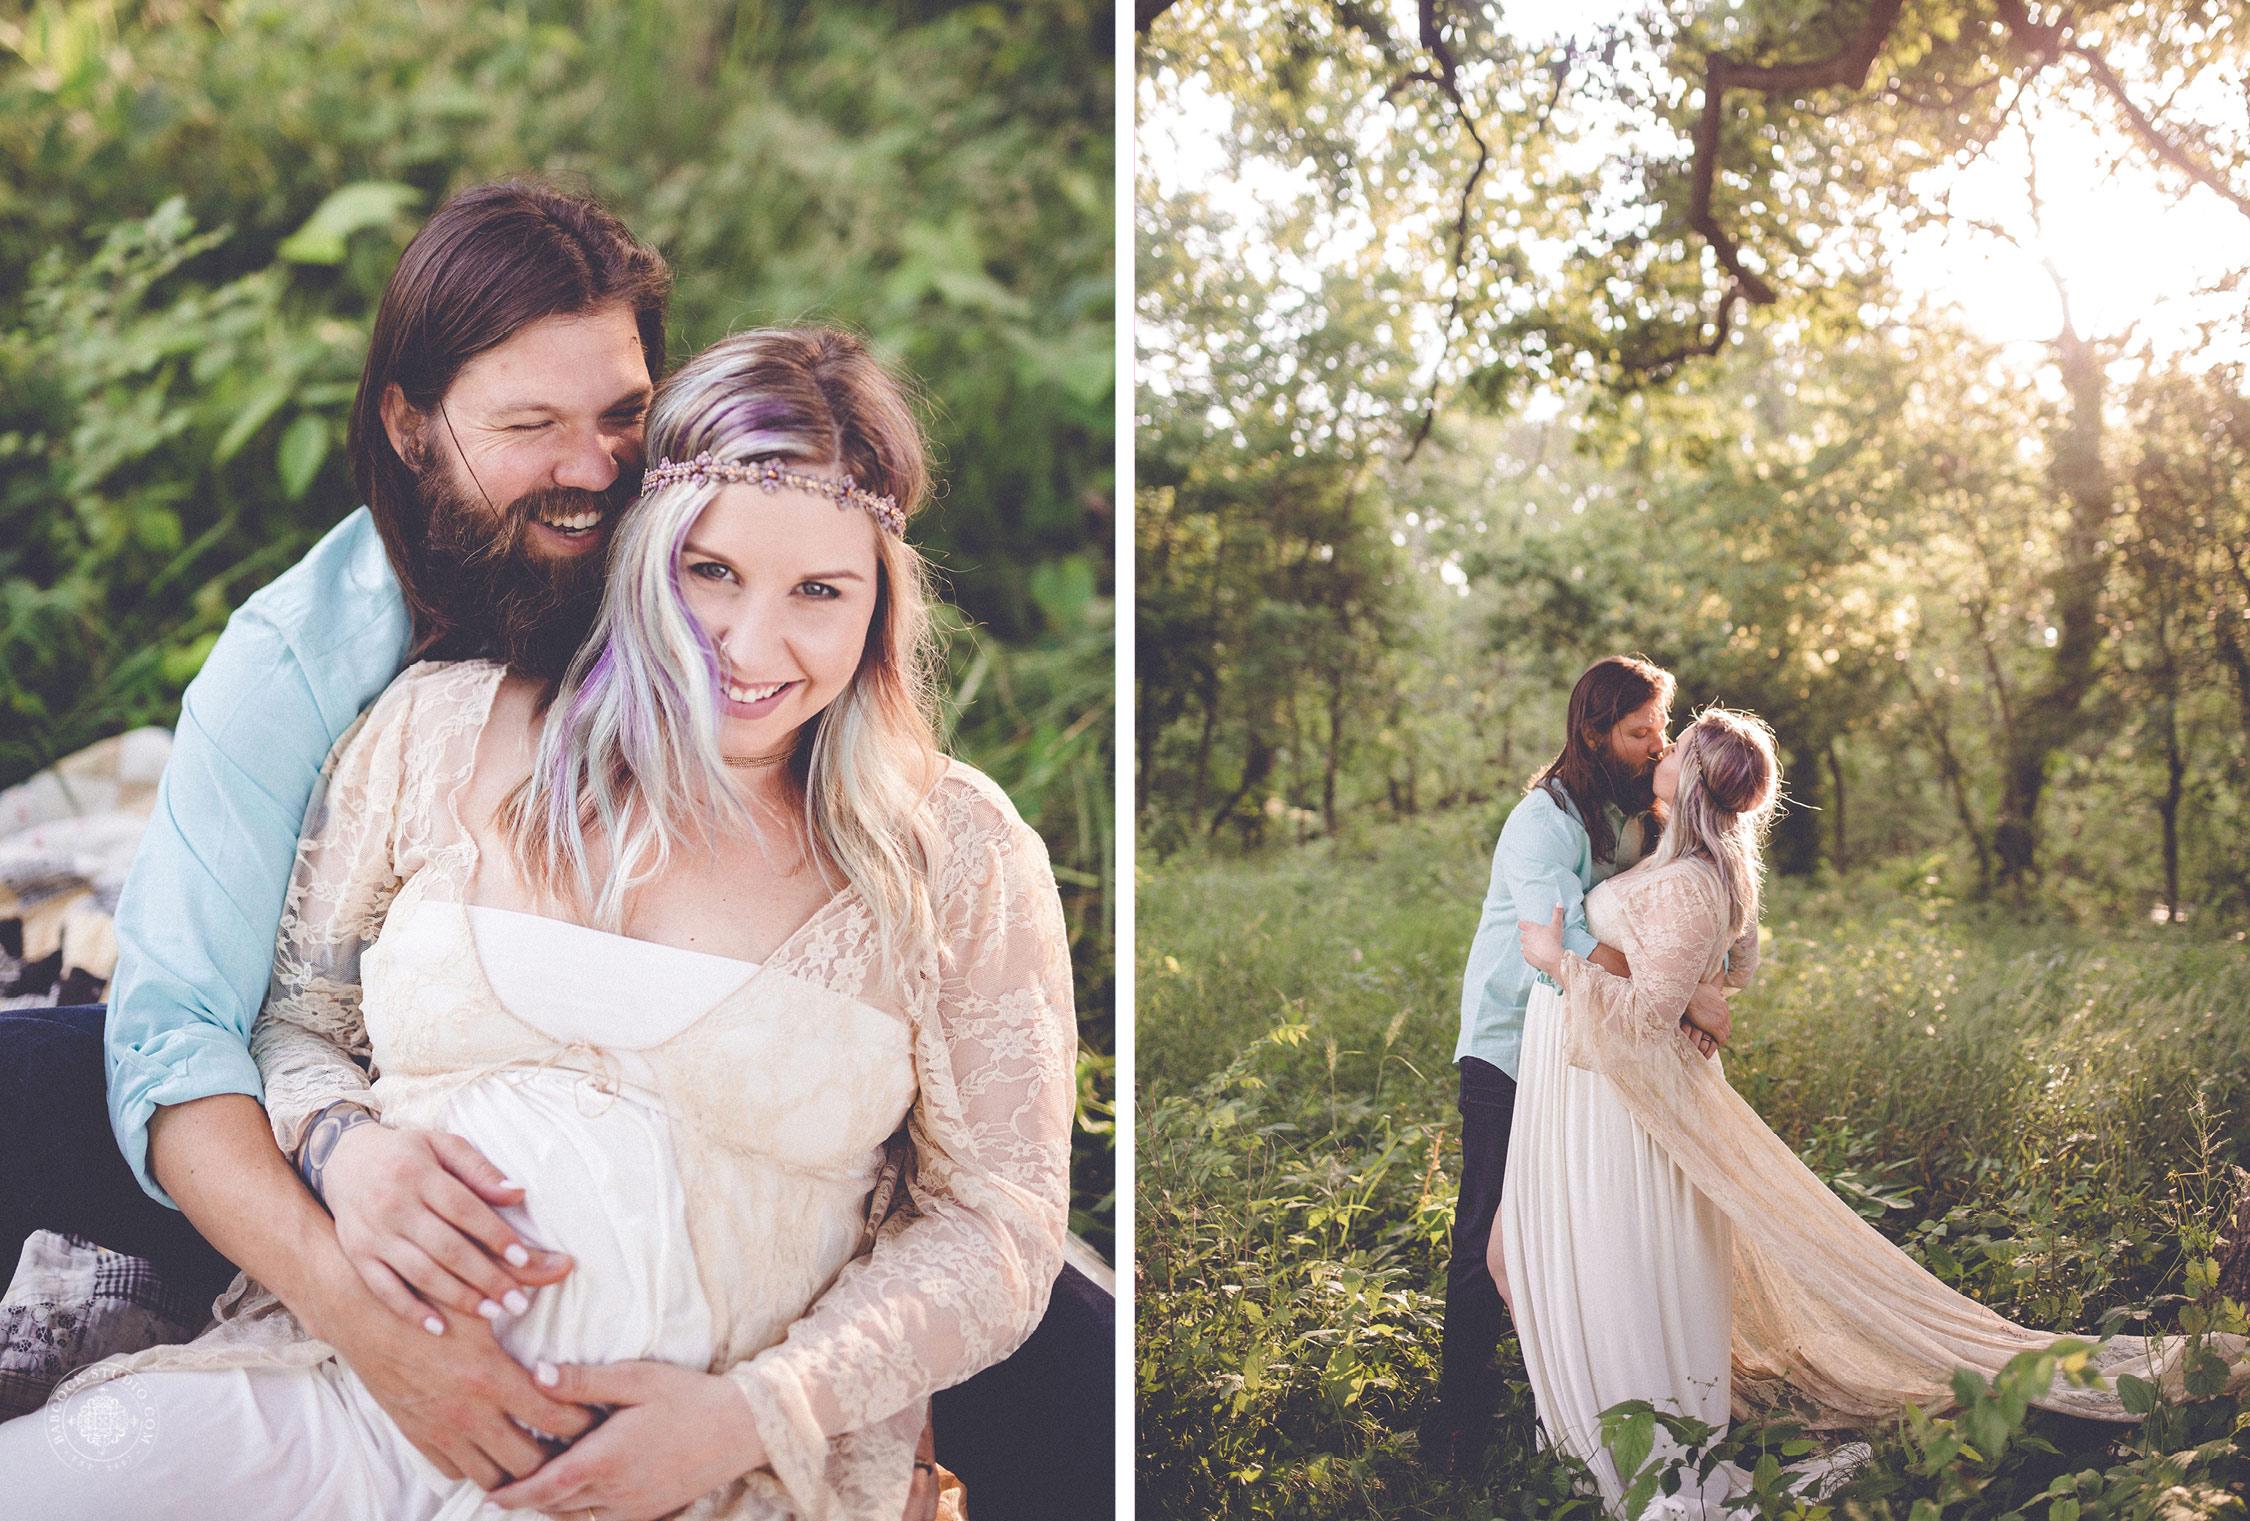 rachel-matt-maternity-pregnancy-photographer-dayton-ohio-7.jpg